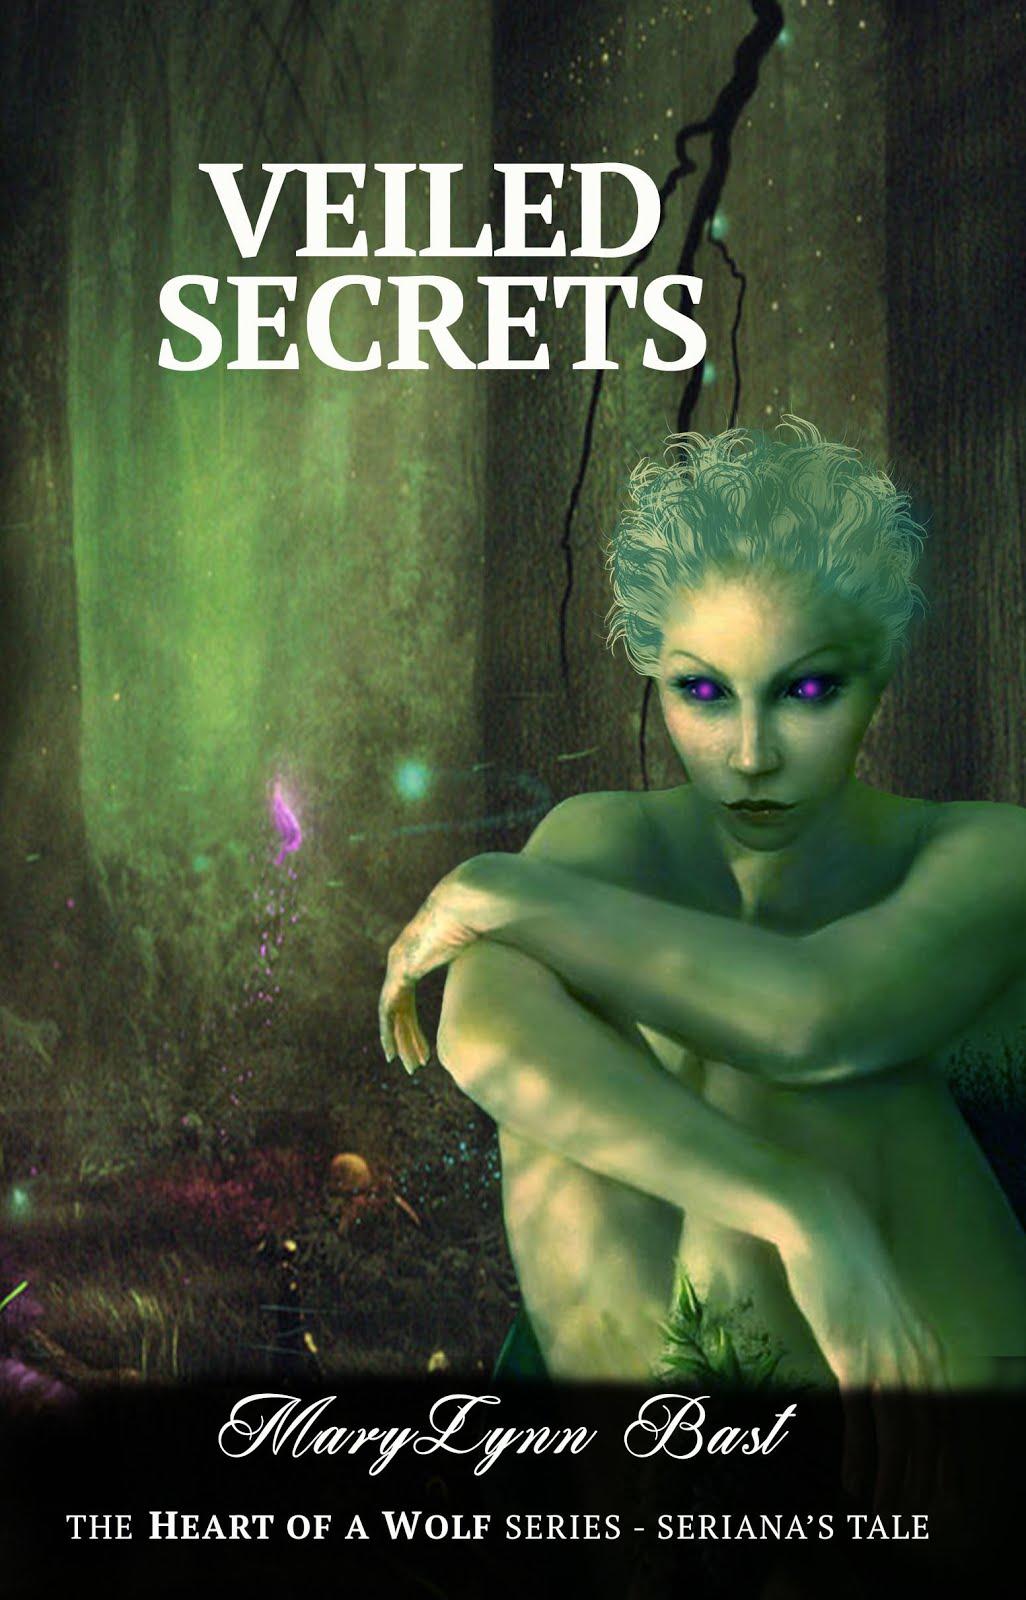 Veiled Secrets